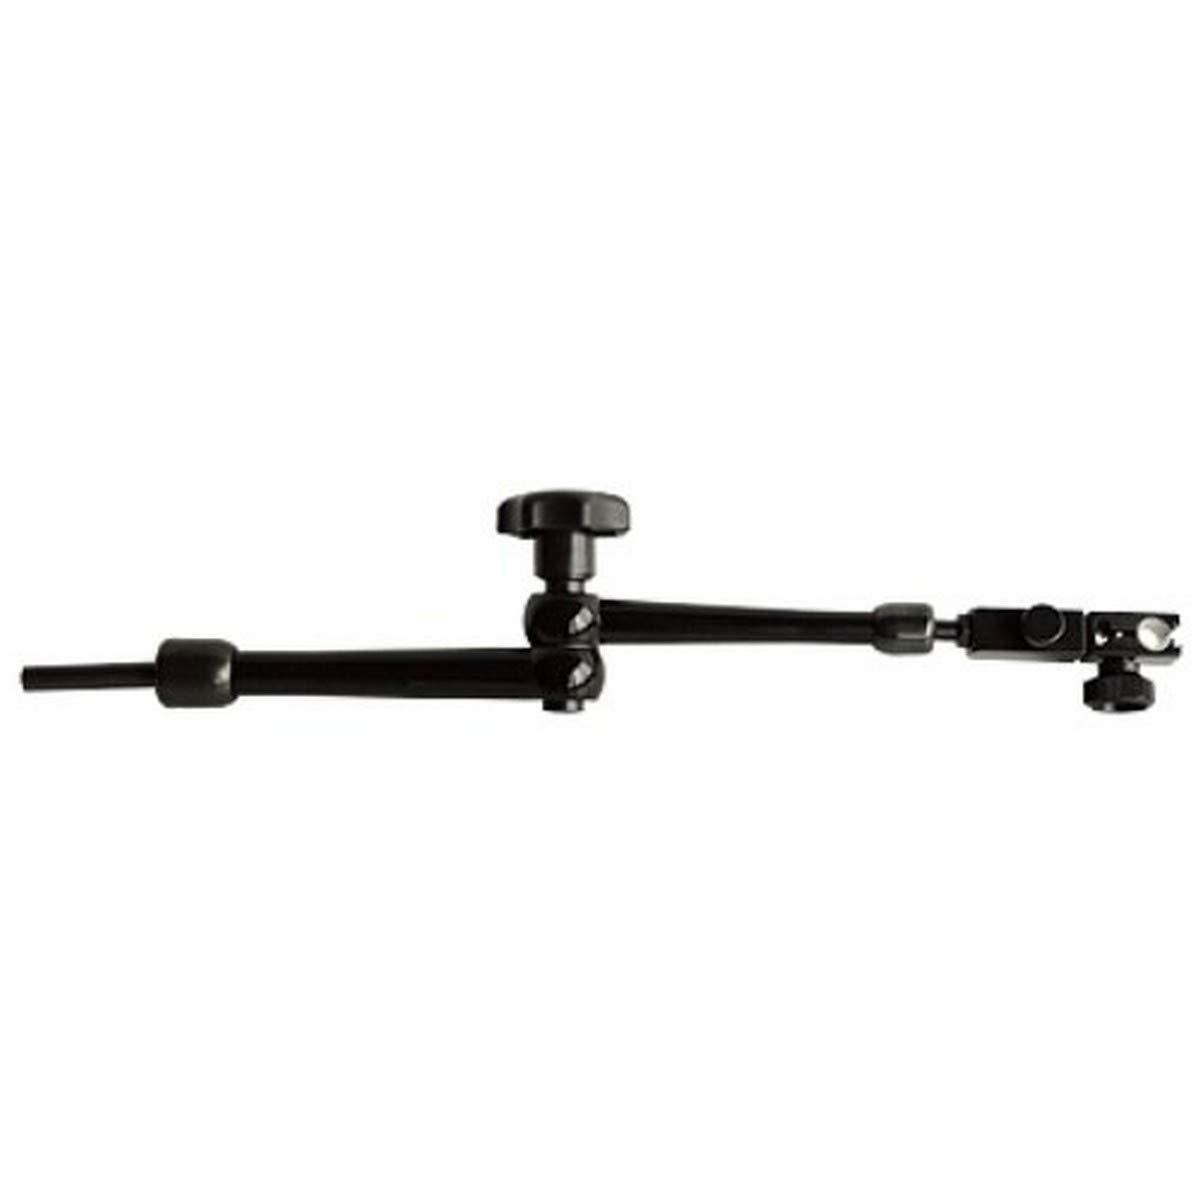 HHIP 4401-0115 Universal Arm Indicator Length Overseas parallel import regular item 11